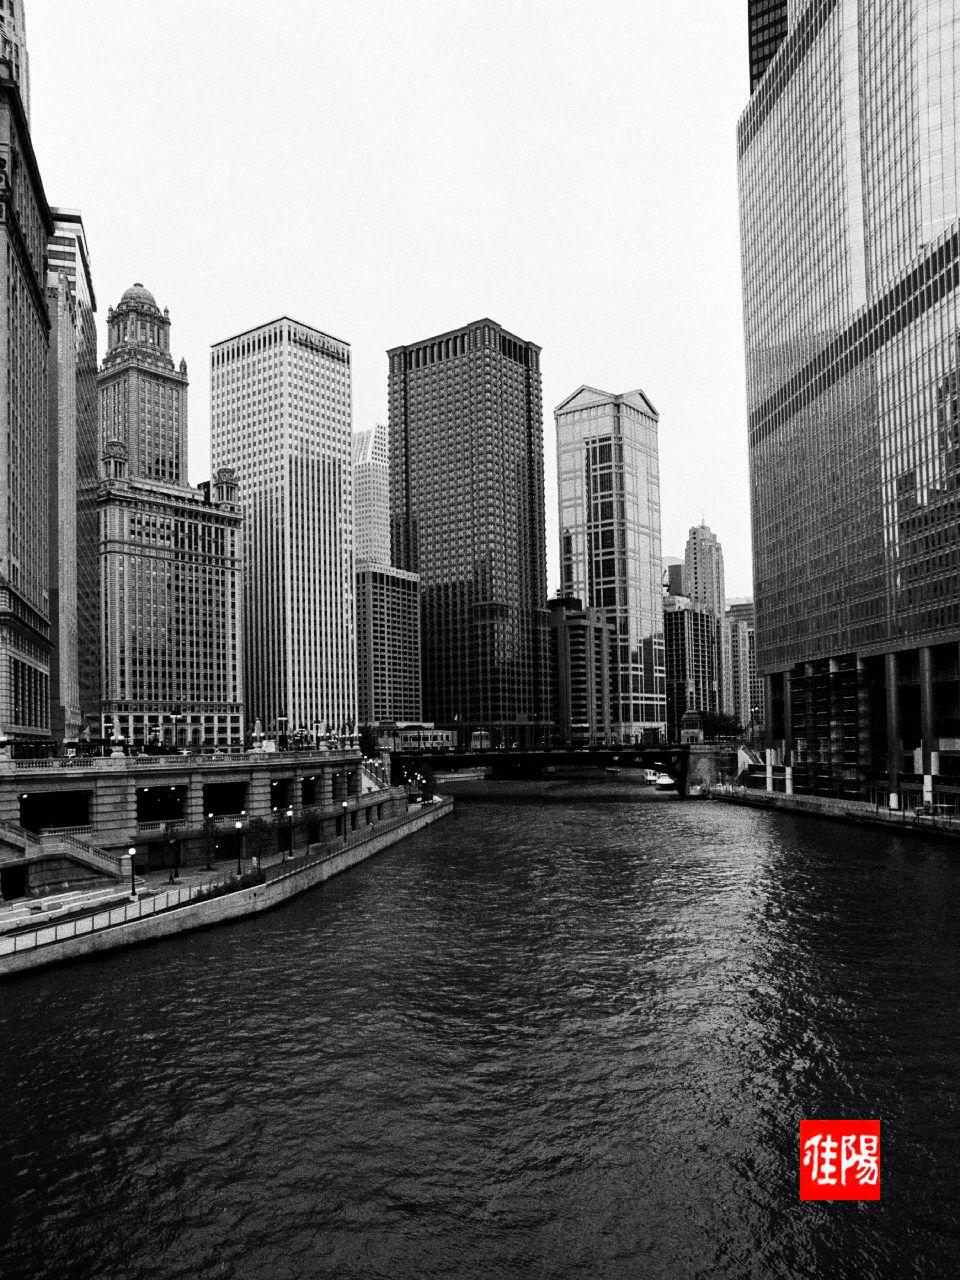 AE1P_Chi-ChicagoRiver_SWest01